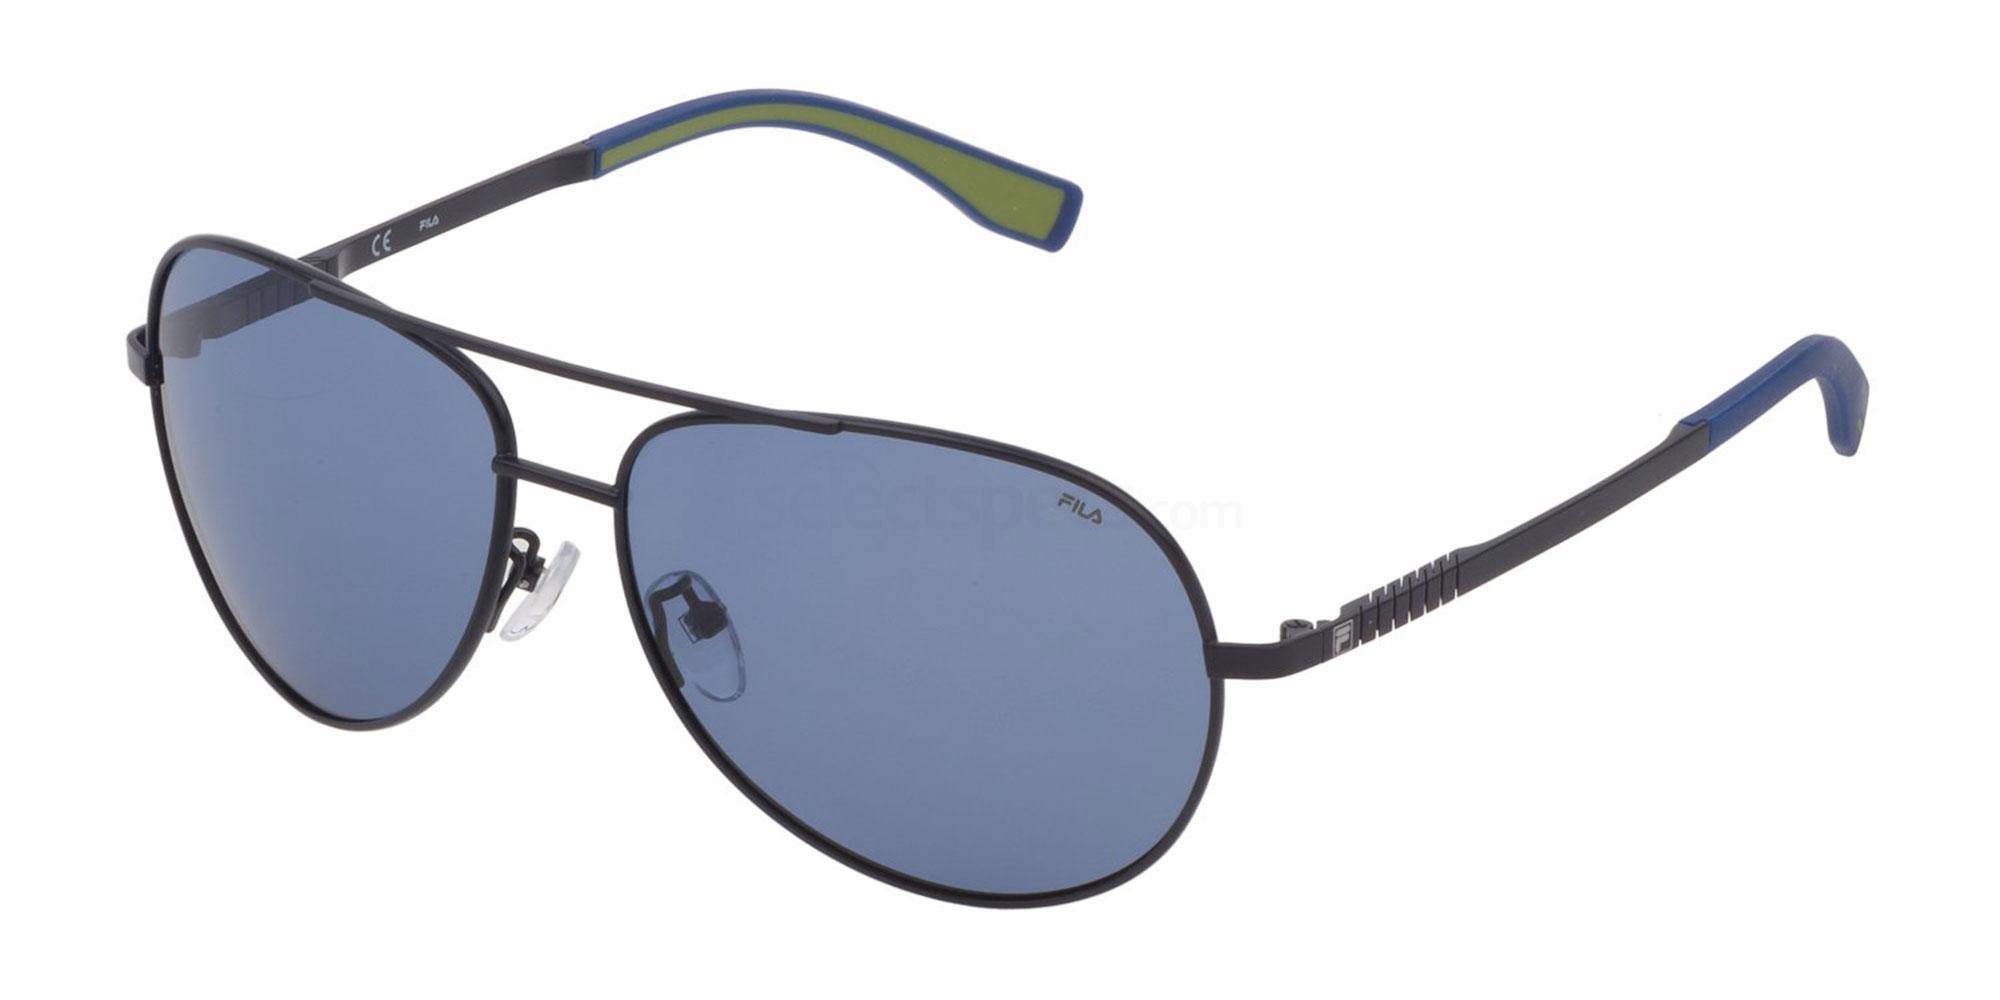 1AQP SF8492 Sunglasses, Fila